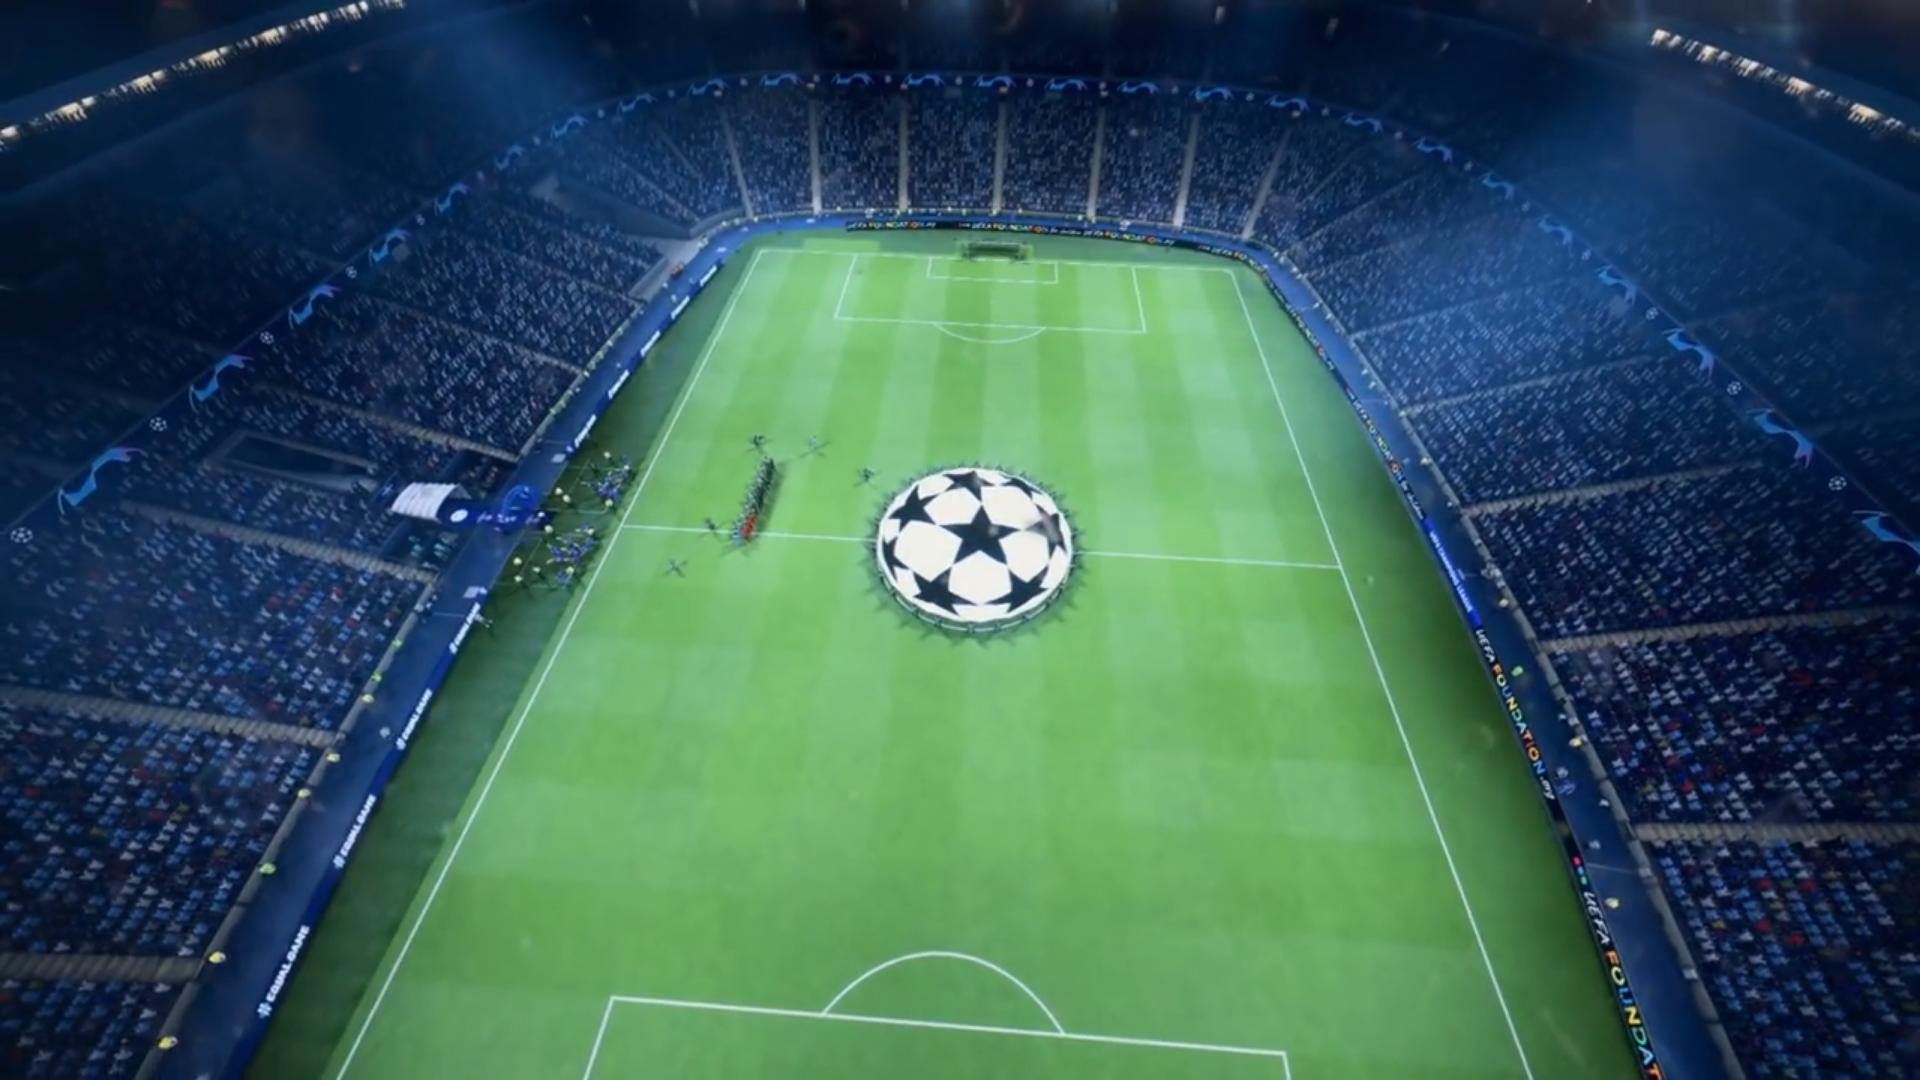 Fut 19 änderungen In Fifa Ultimate Team Division Rivals Icons